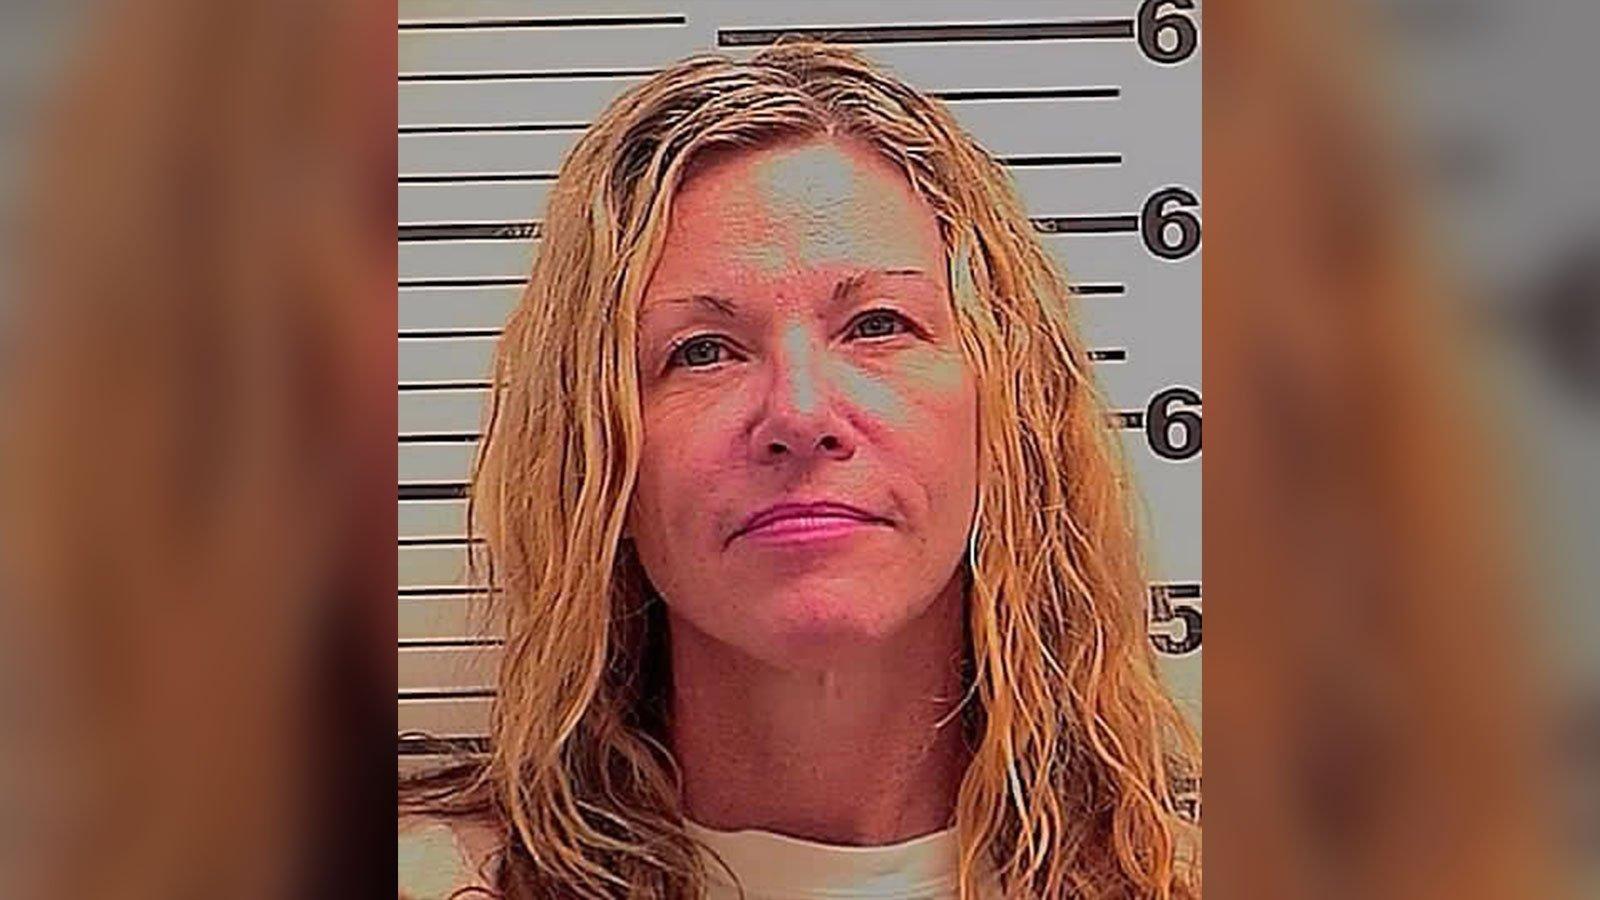 Lori Vallow (Credit: Madison County Sheriff's Office)